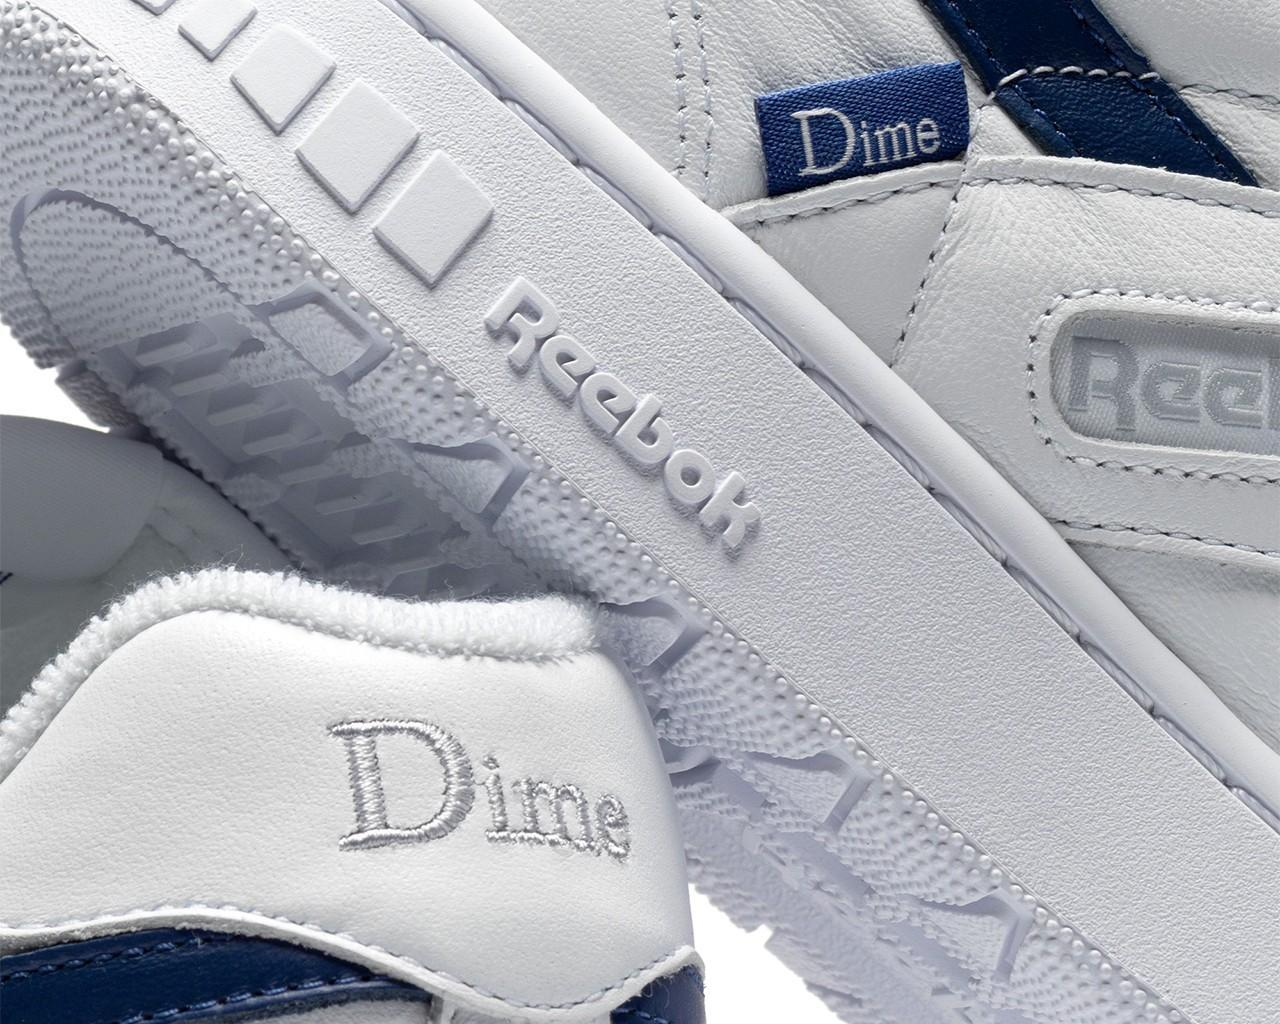 Chaussure Reebok Dime BB 400 2